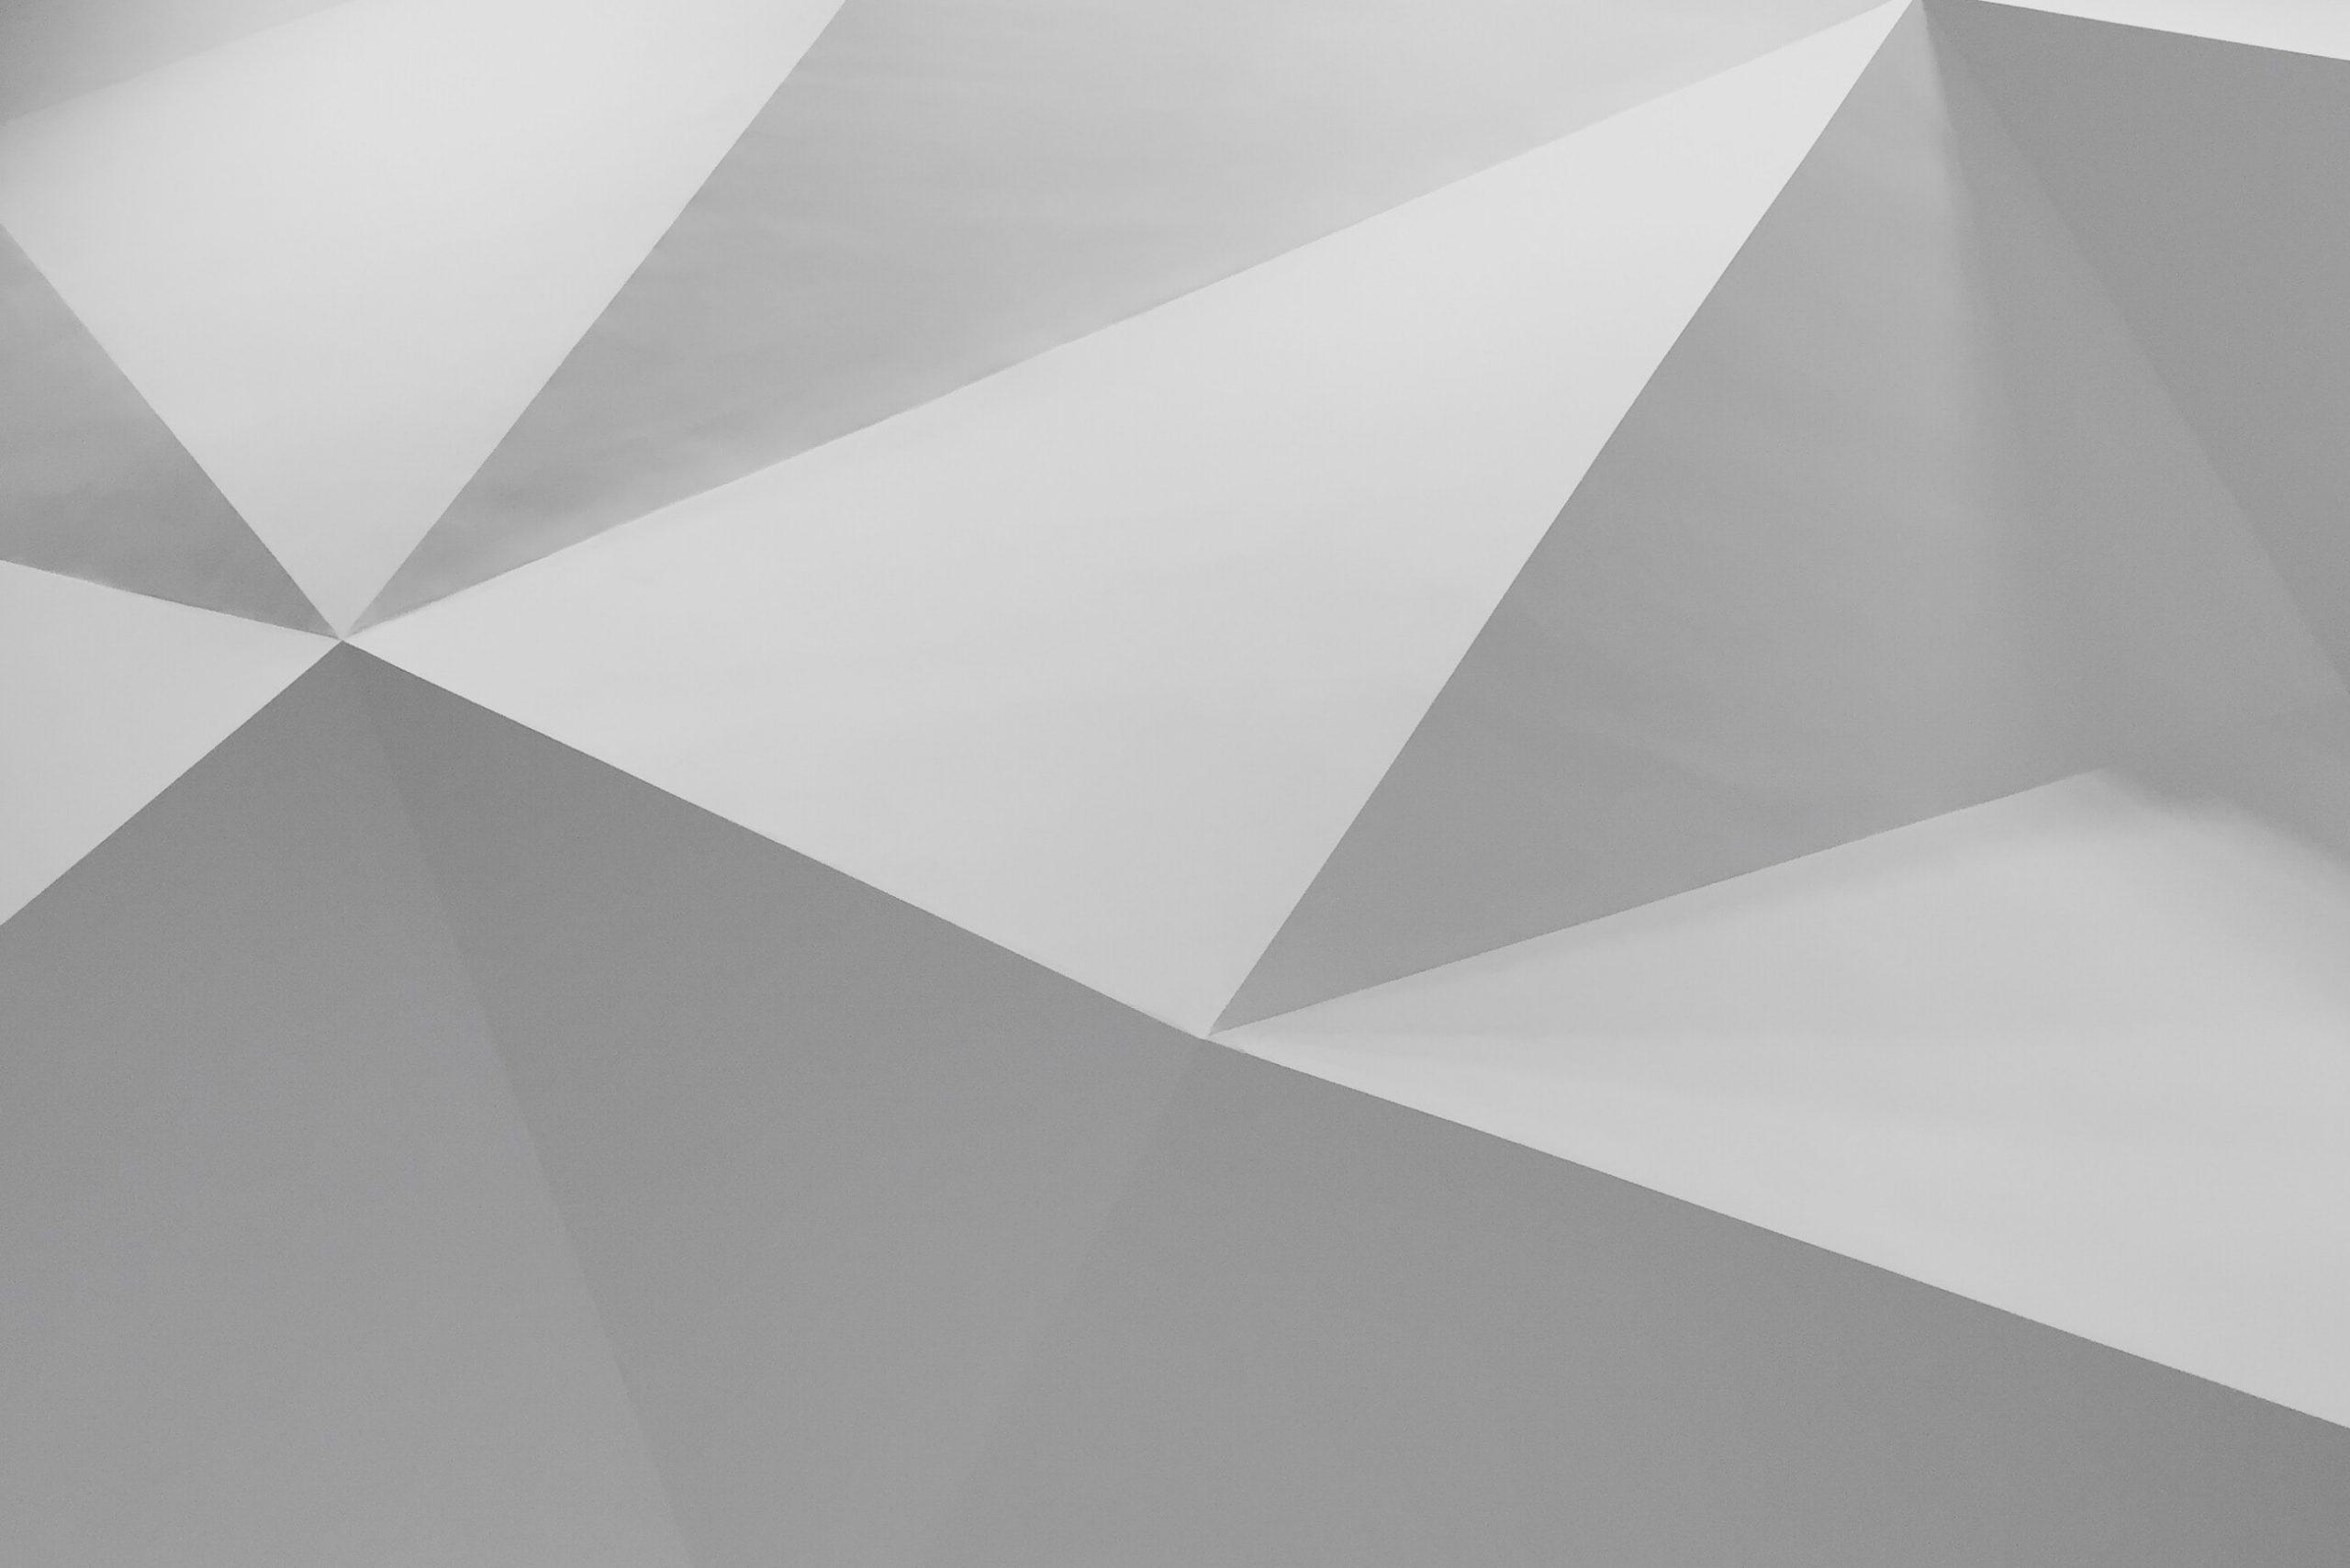 shapelined-_JBKdviweXI-unsplash